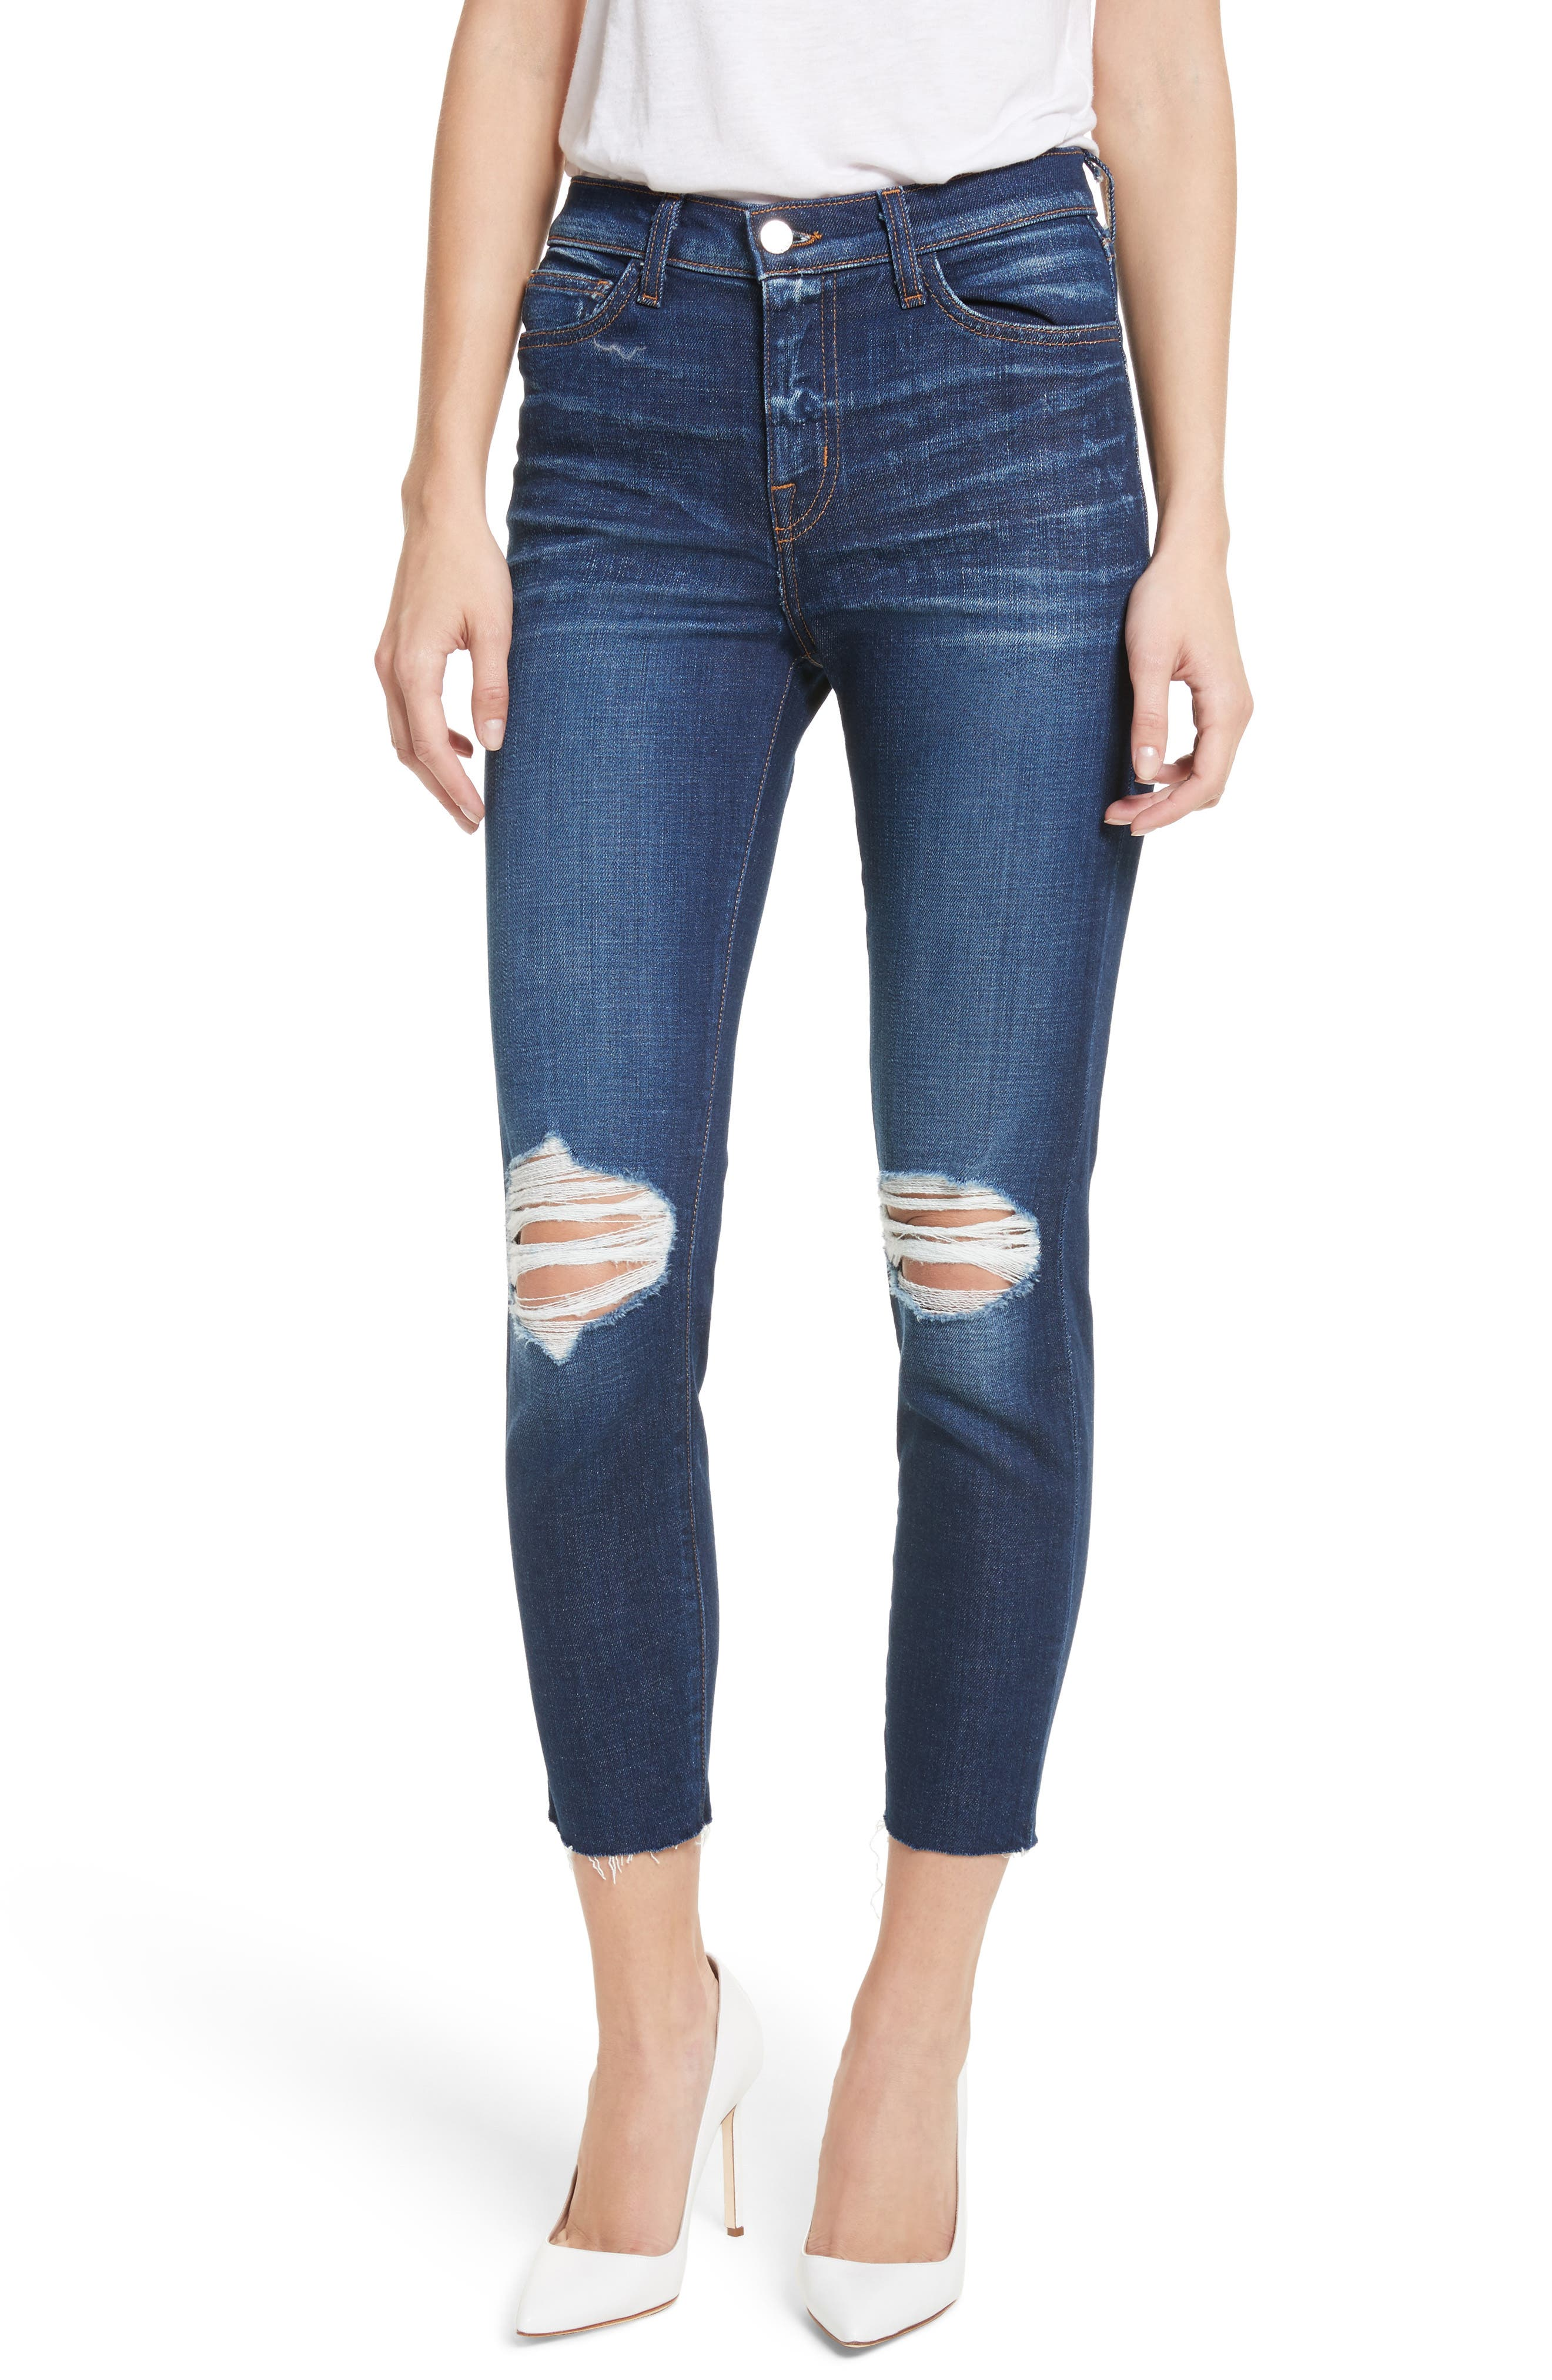 Abigail French Slim Ripped Skinny Jeans,                         Main,                         color, Dark Diamond Destruct